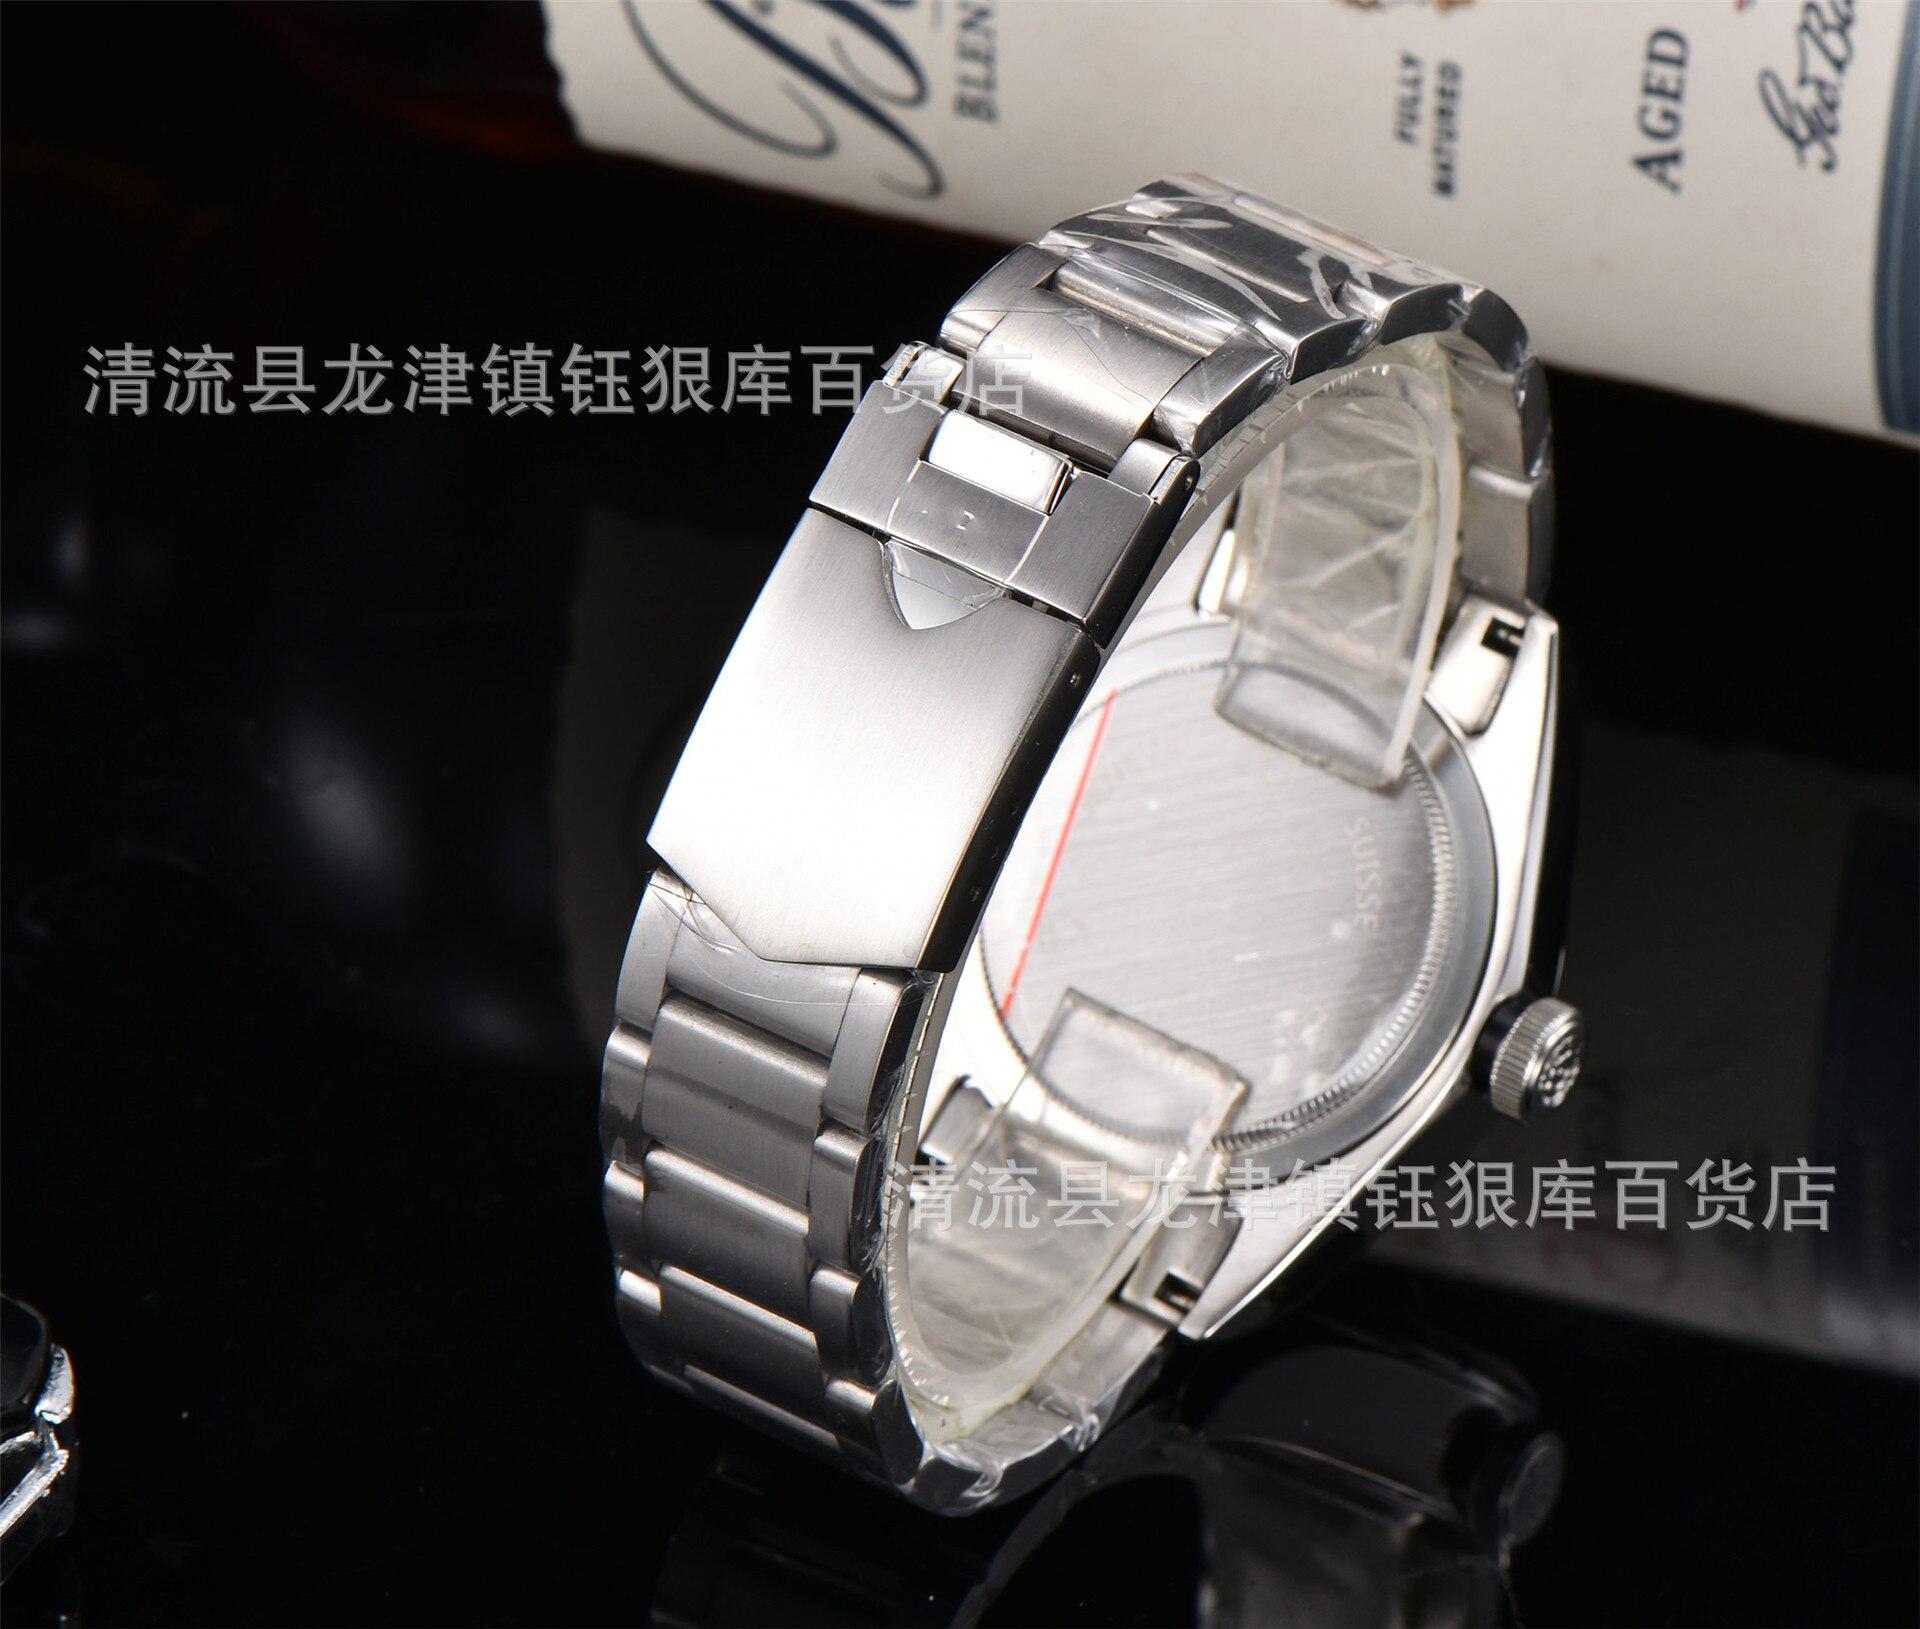 New fashion men's high grade business watch waterproof watch AAA + high quality watch enlarge